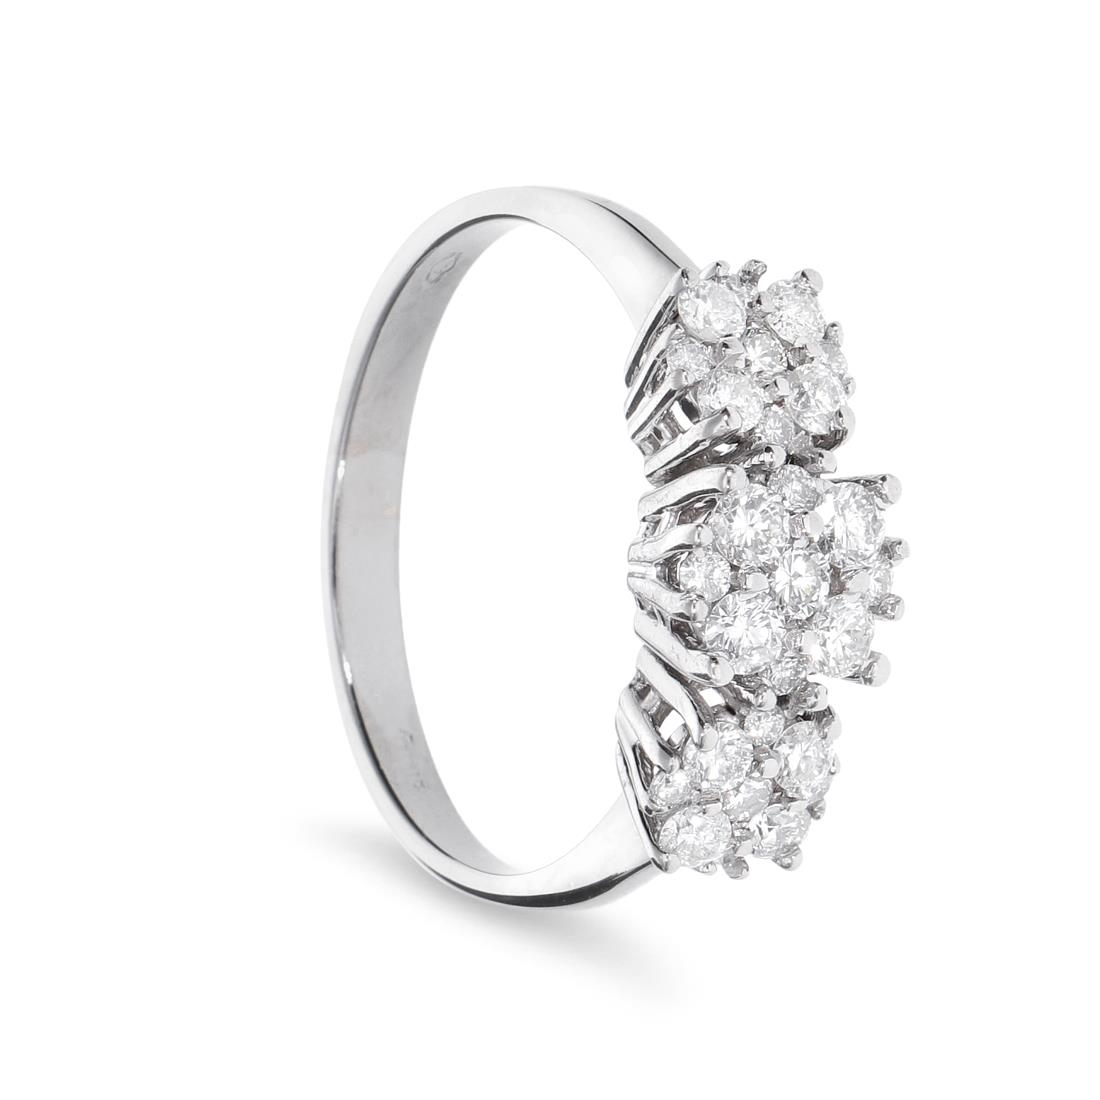 Anello trilogy con diamanti - ORO&CO